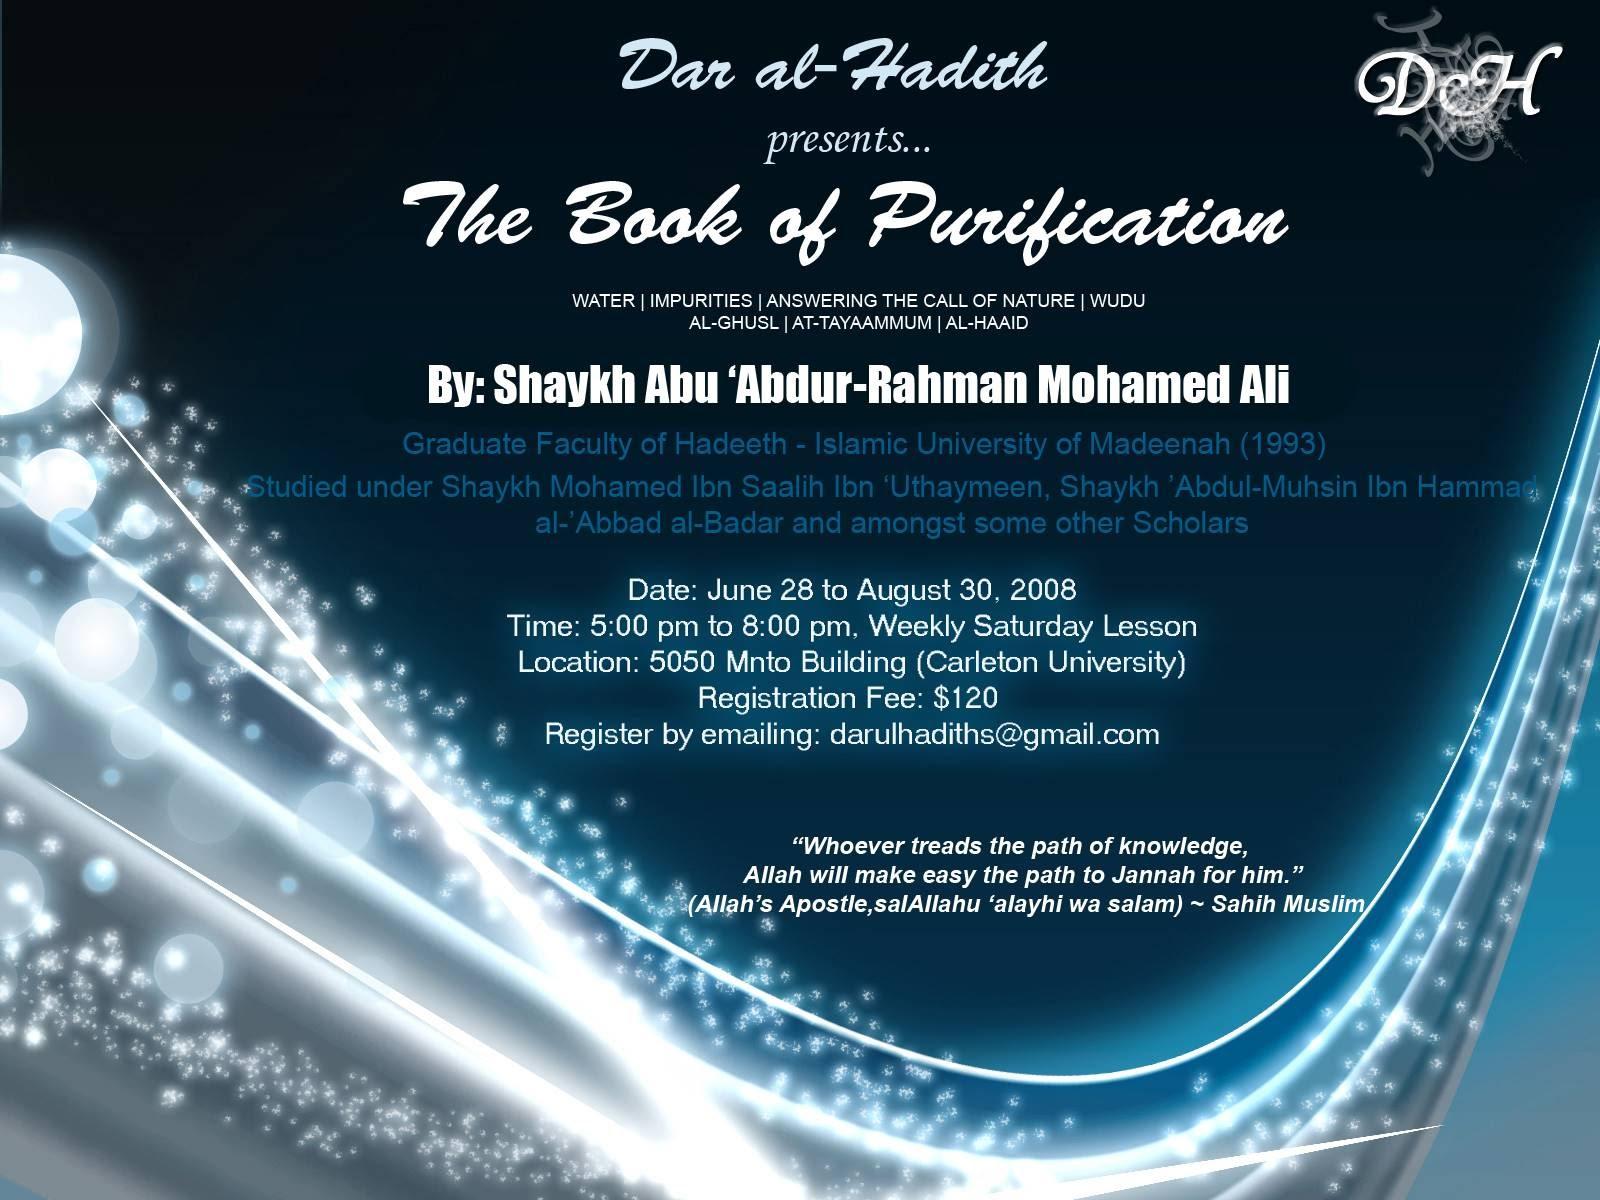 Dar al-Hadith presents The Book of Purification